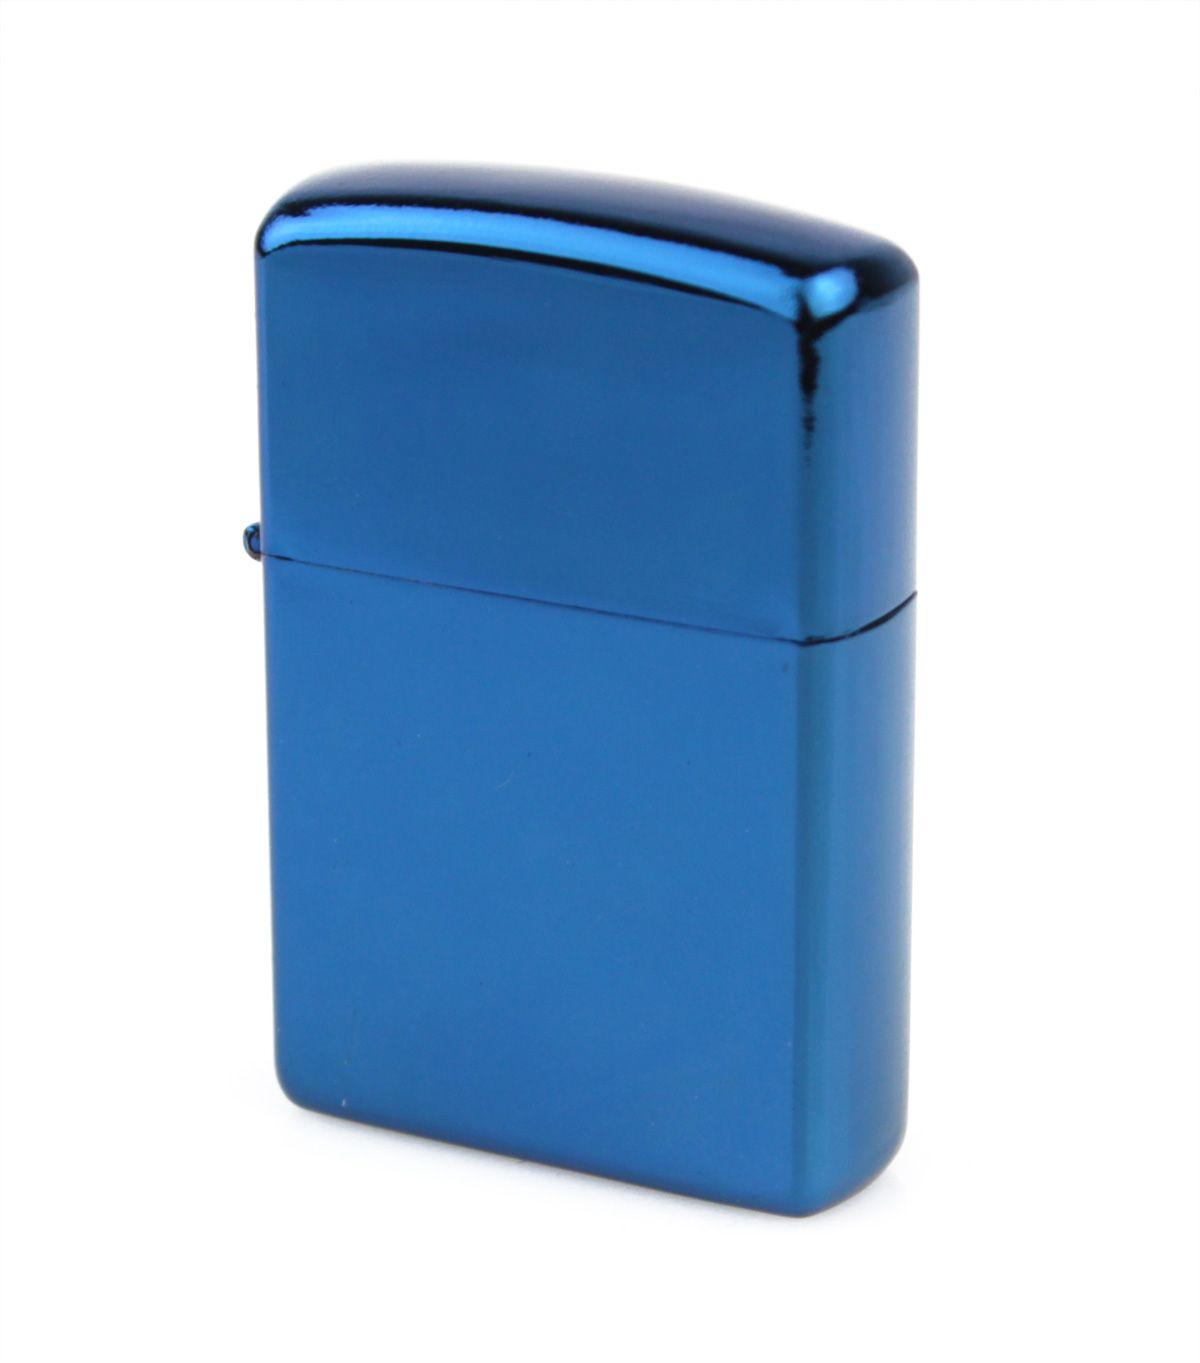 Blue Cigarette Lighter Blue Cigarette Lighter Usb